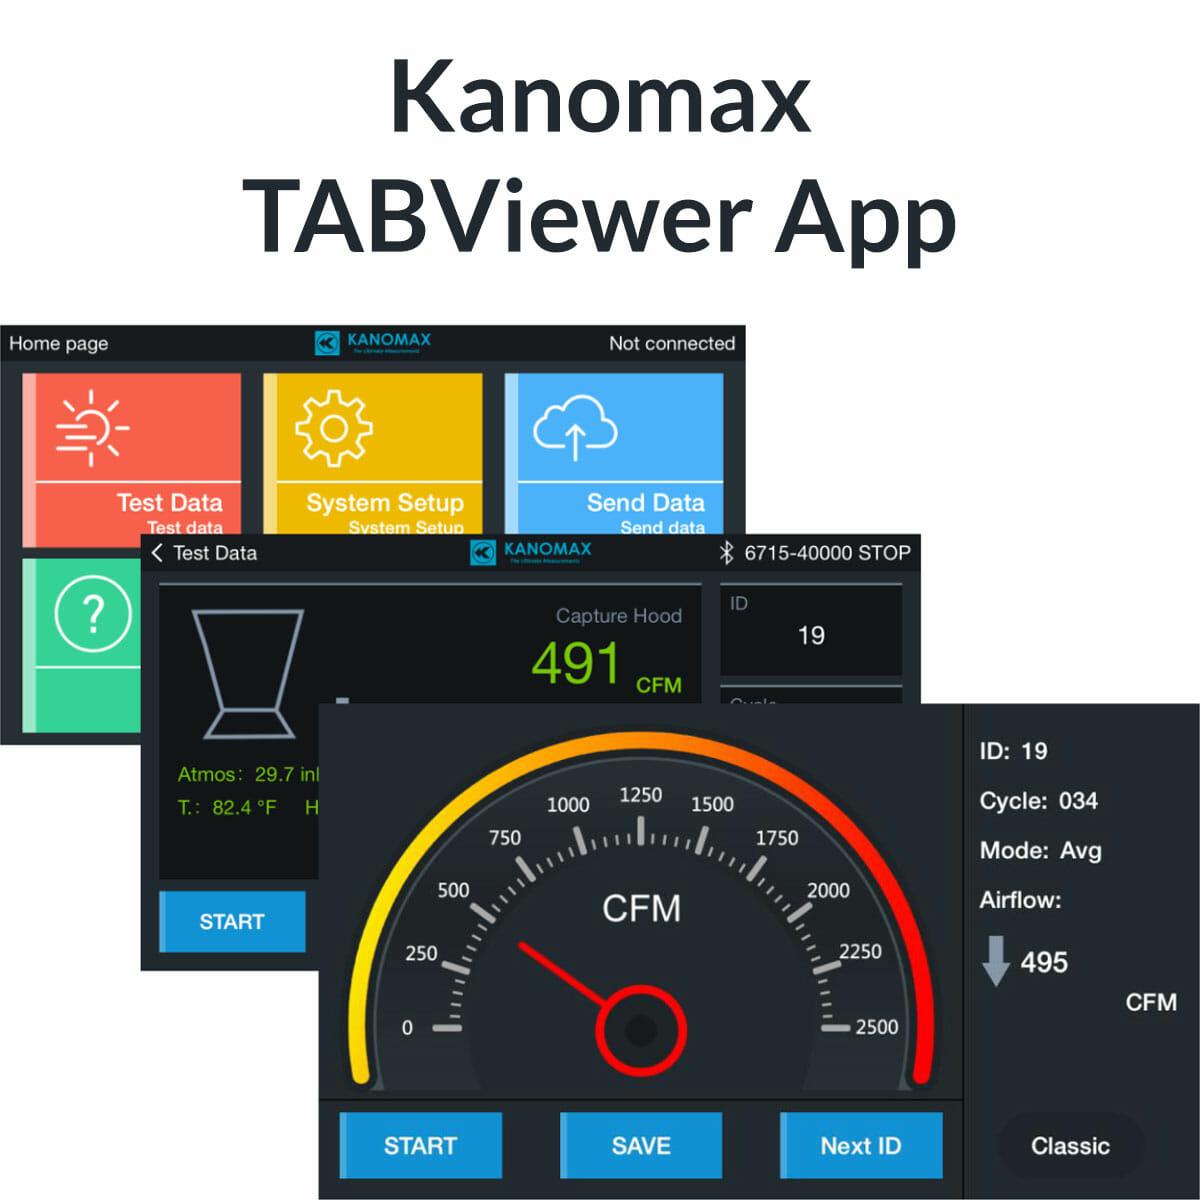 Kanomax TABViewer App Image